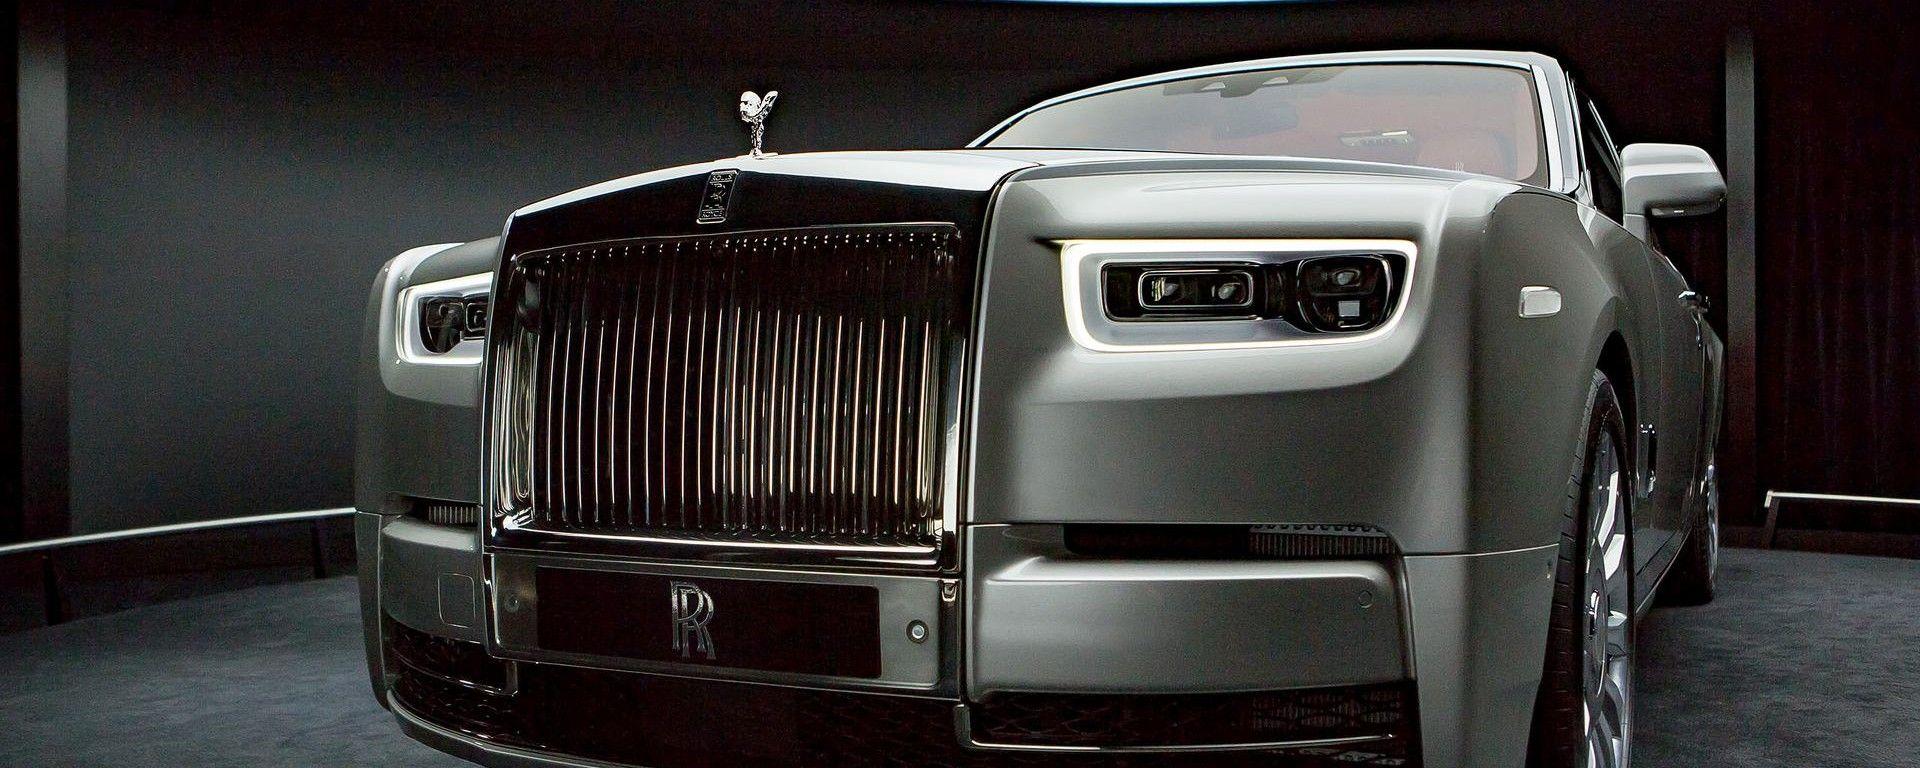 Rolls-Royce Phantom 2018, il classico contemporaneo